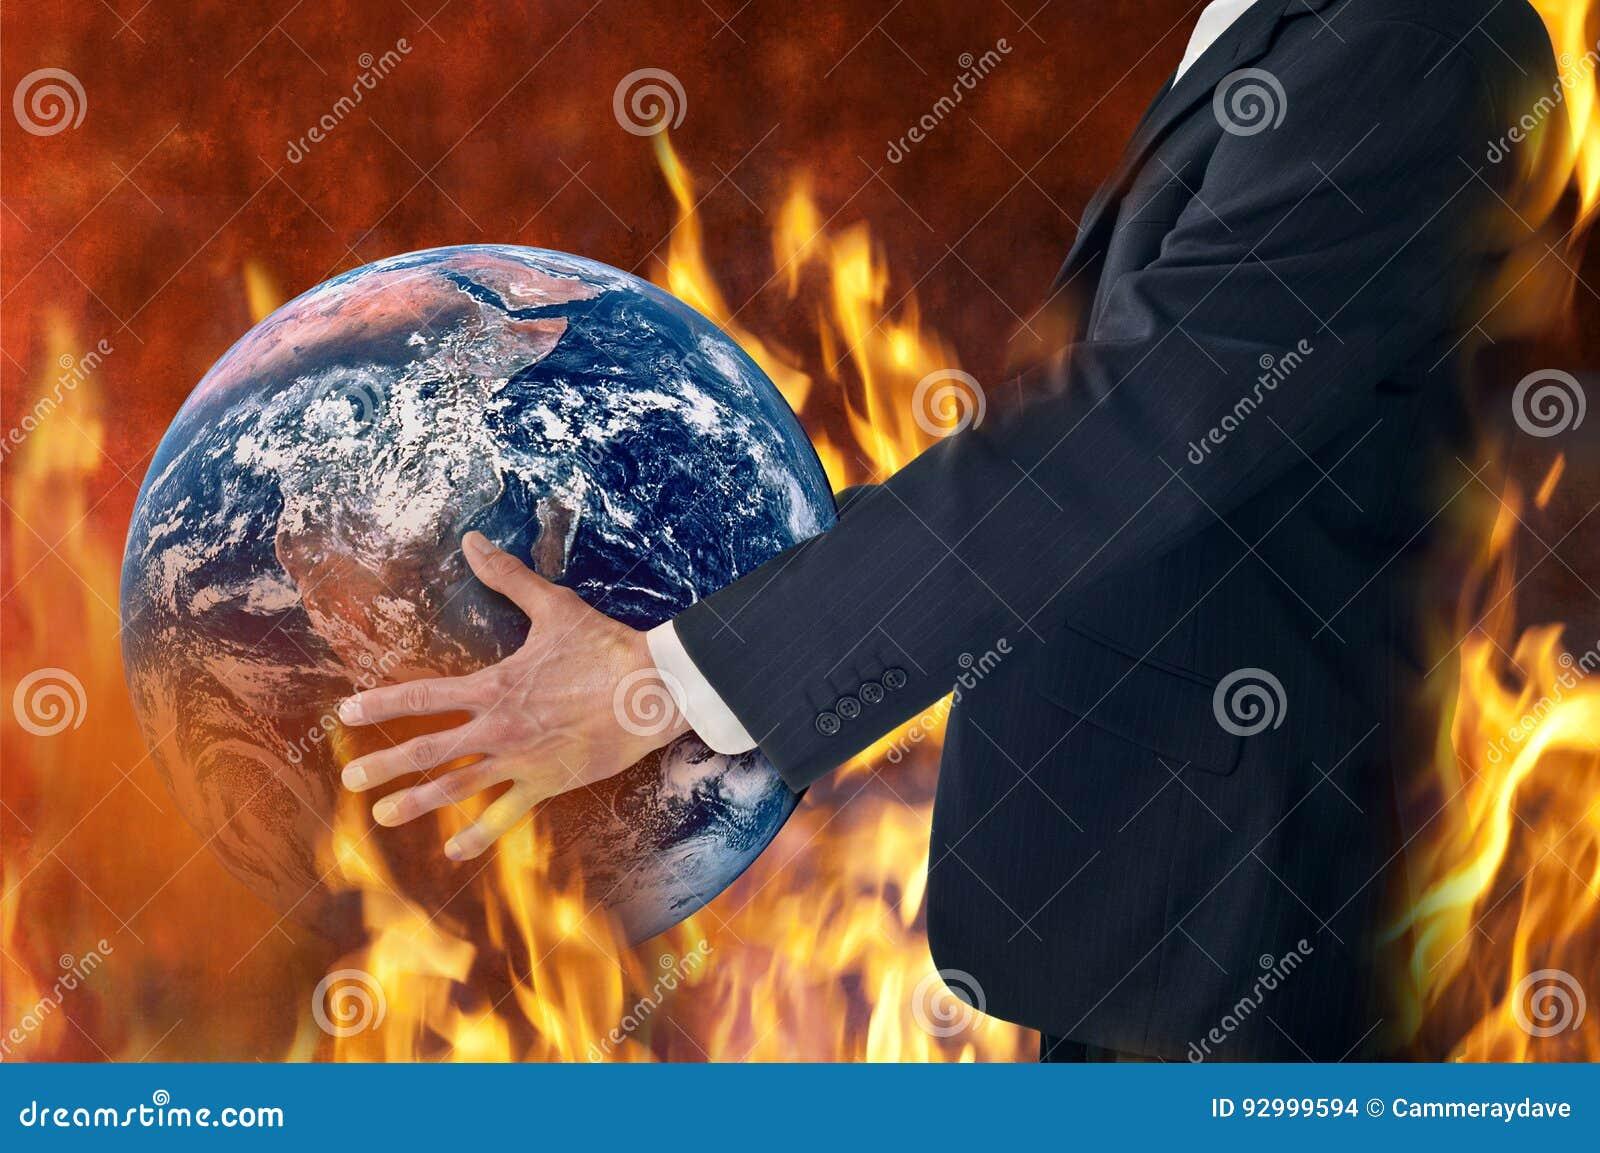 Climate Change Global Fire Heatwave Business Trump